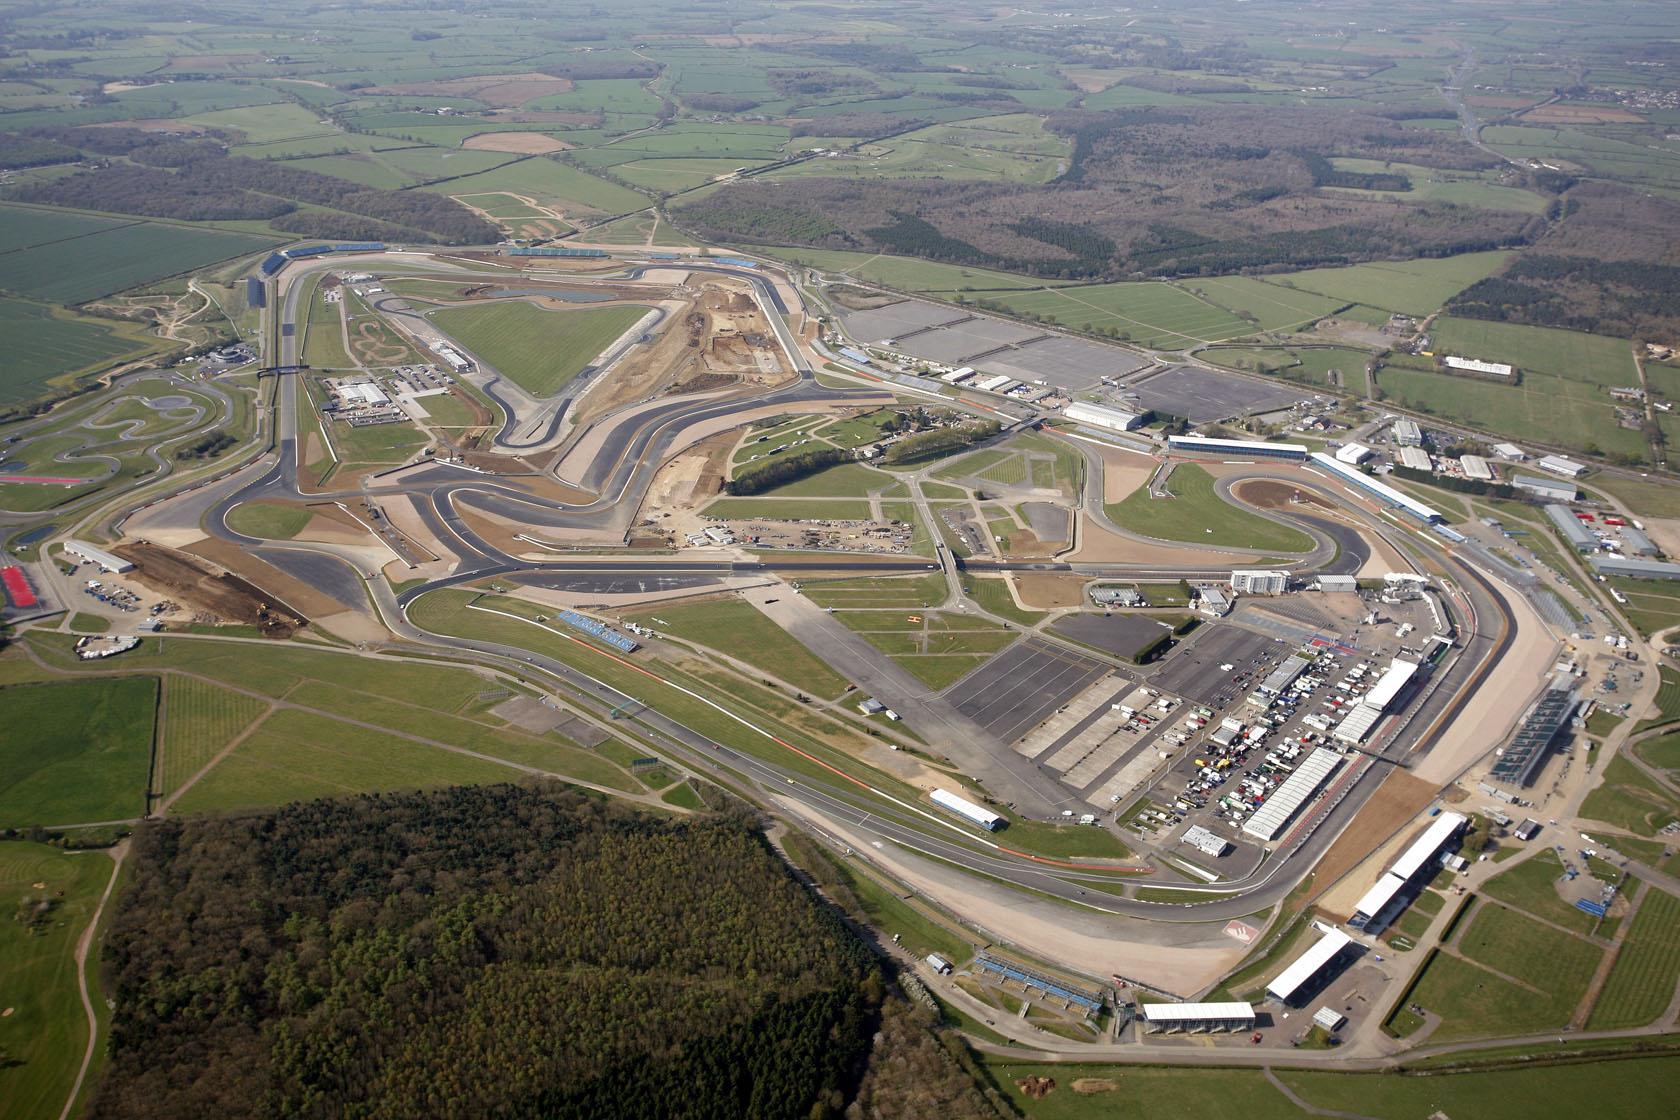 2012MotoGP_rd06_New-Silverstone-Grand-Prix-Circuit-2.jpg